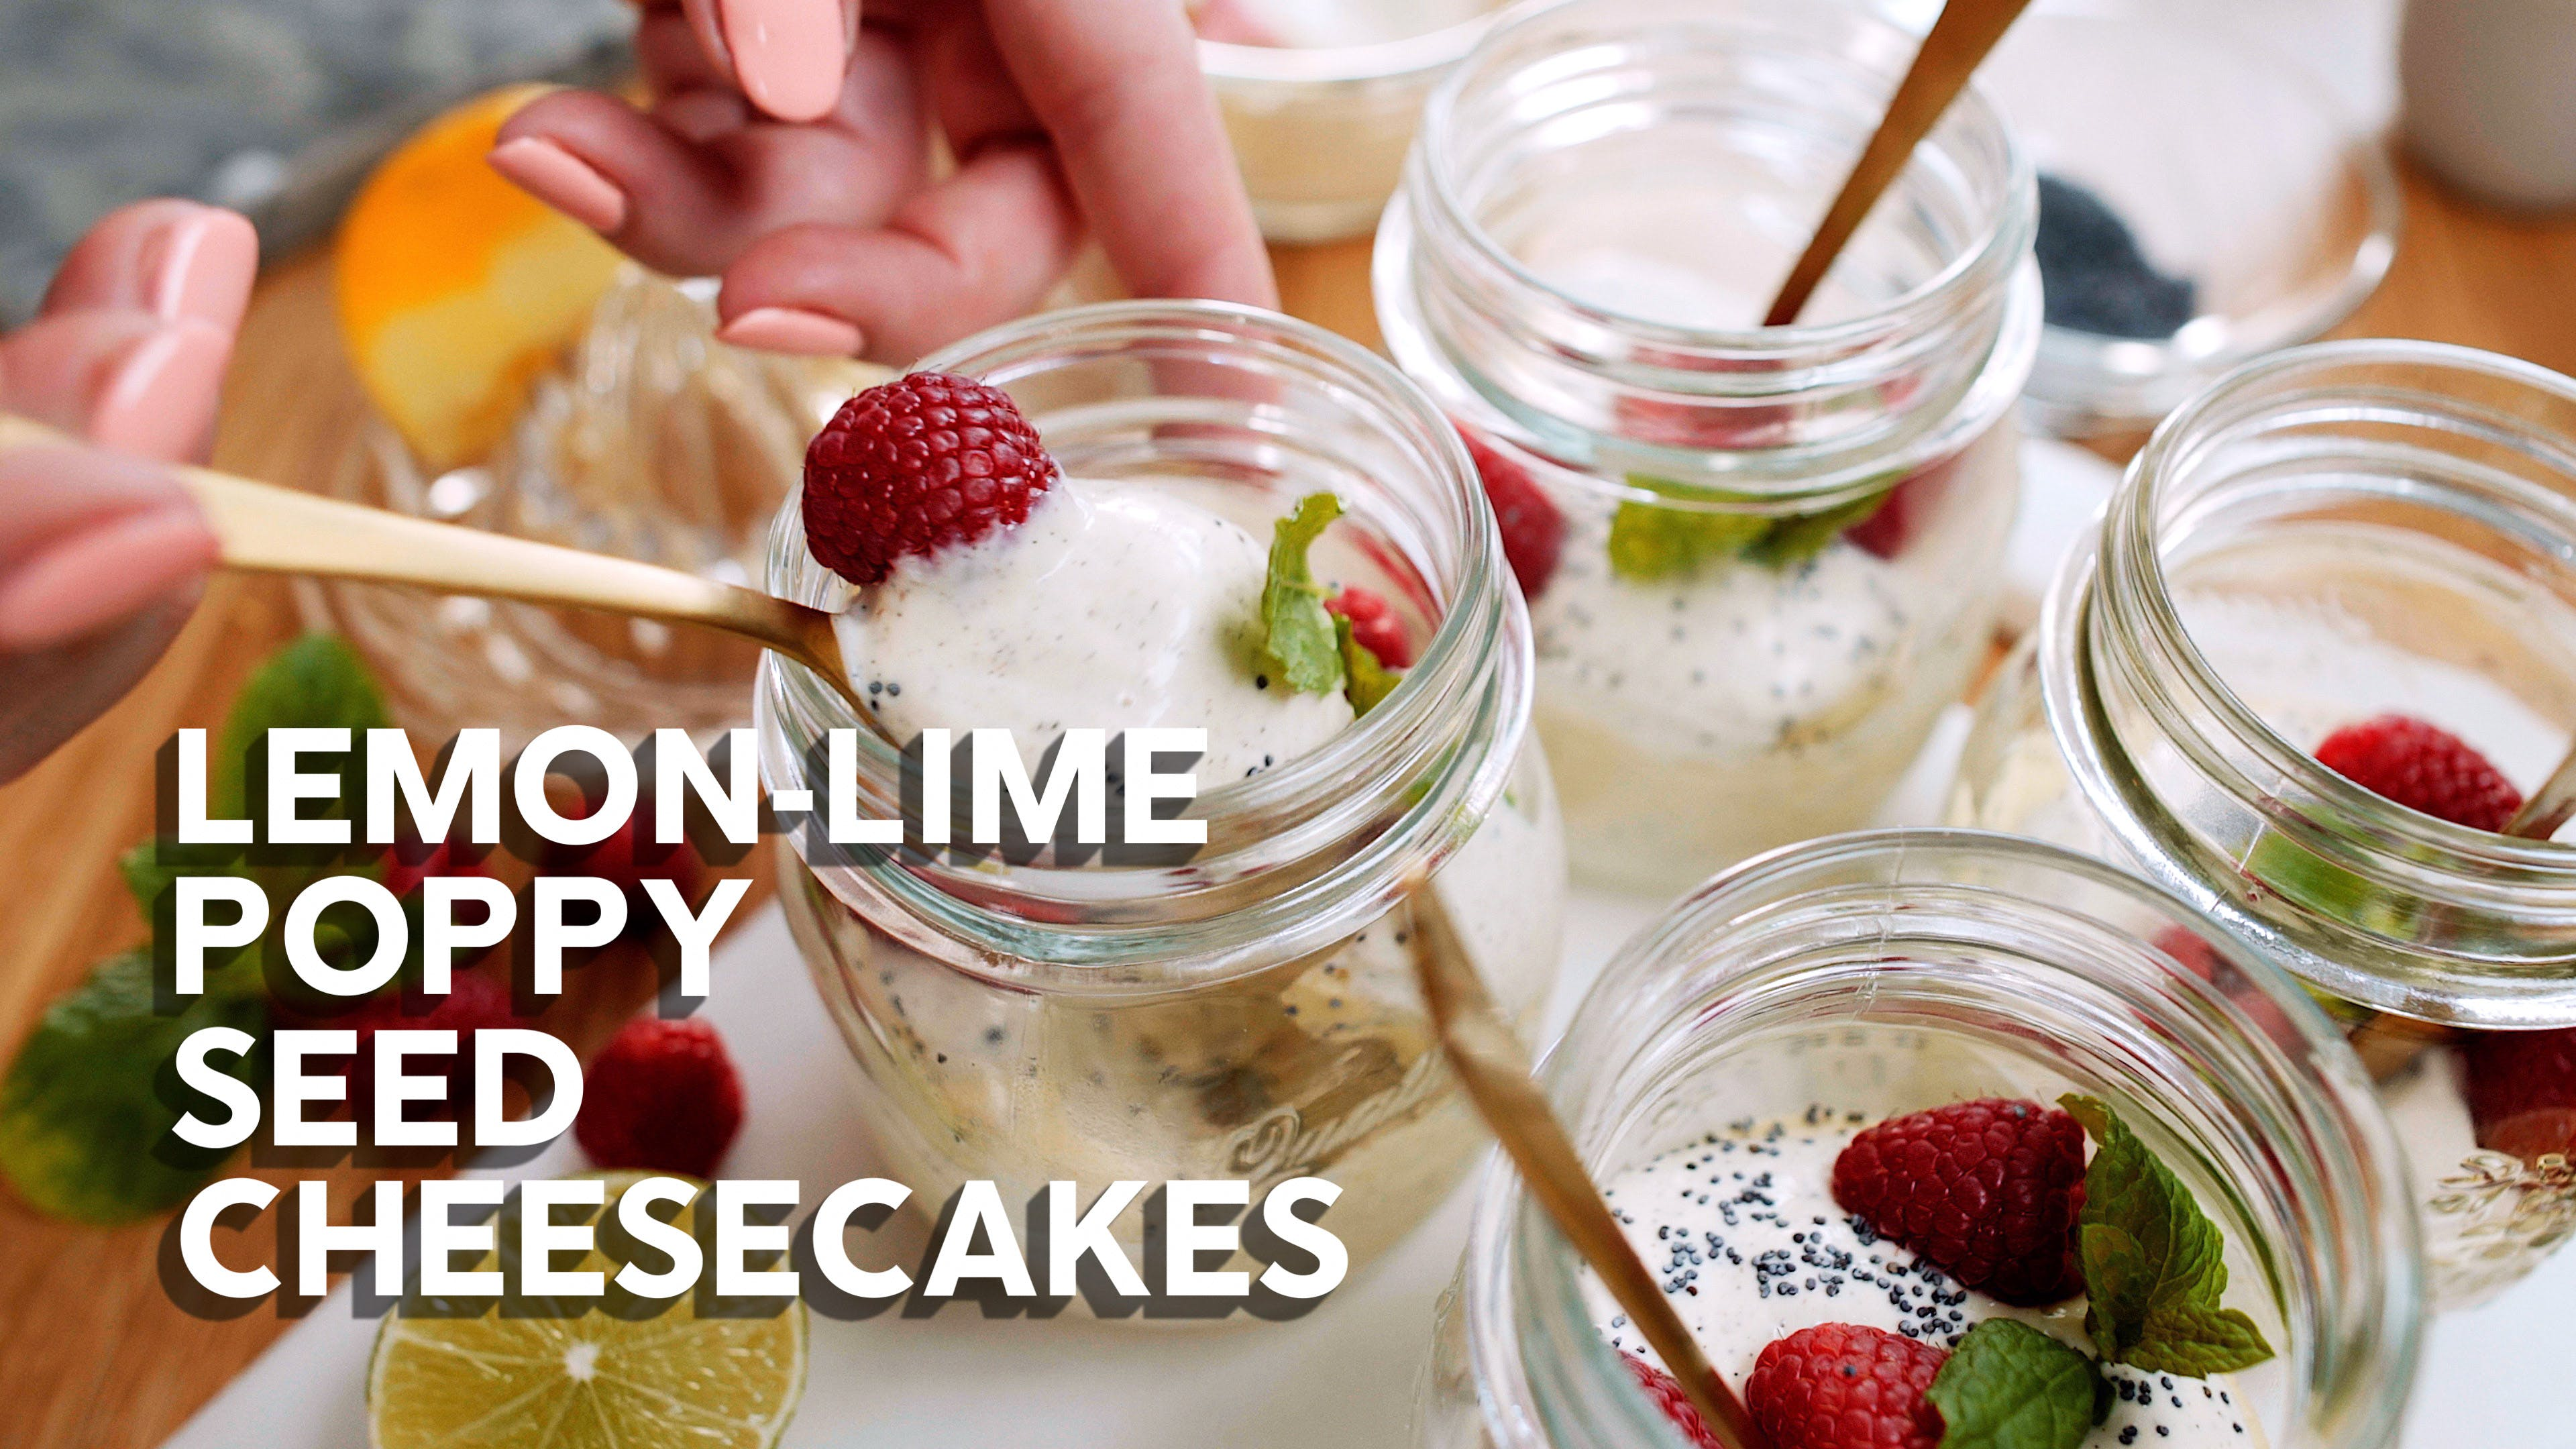 Lemon-lime poppy seed cheesecakes